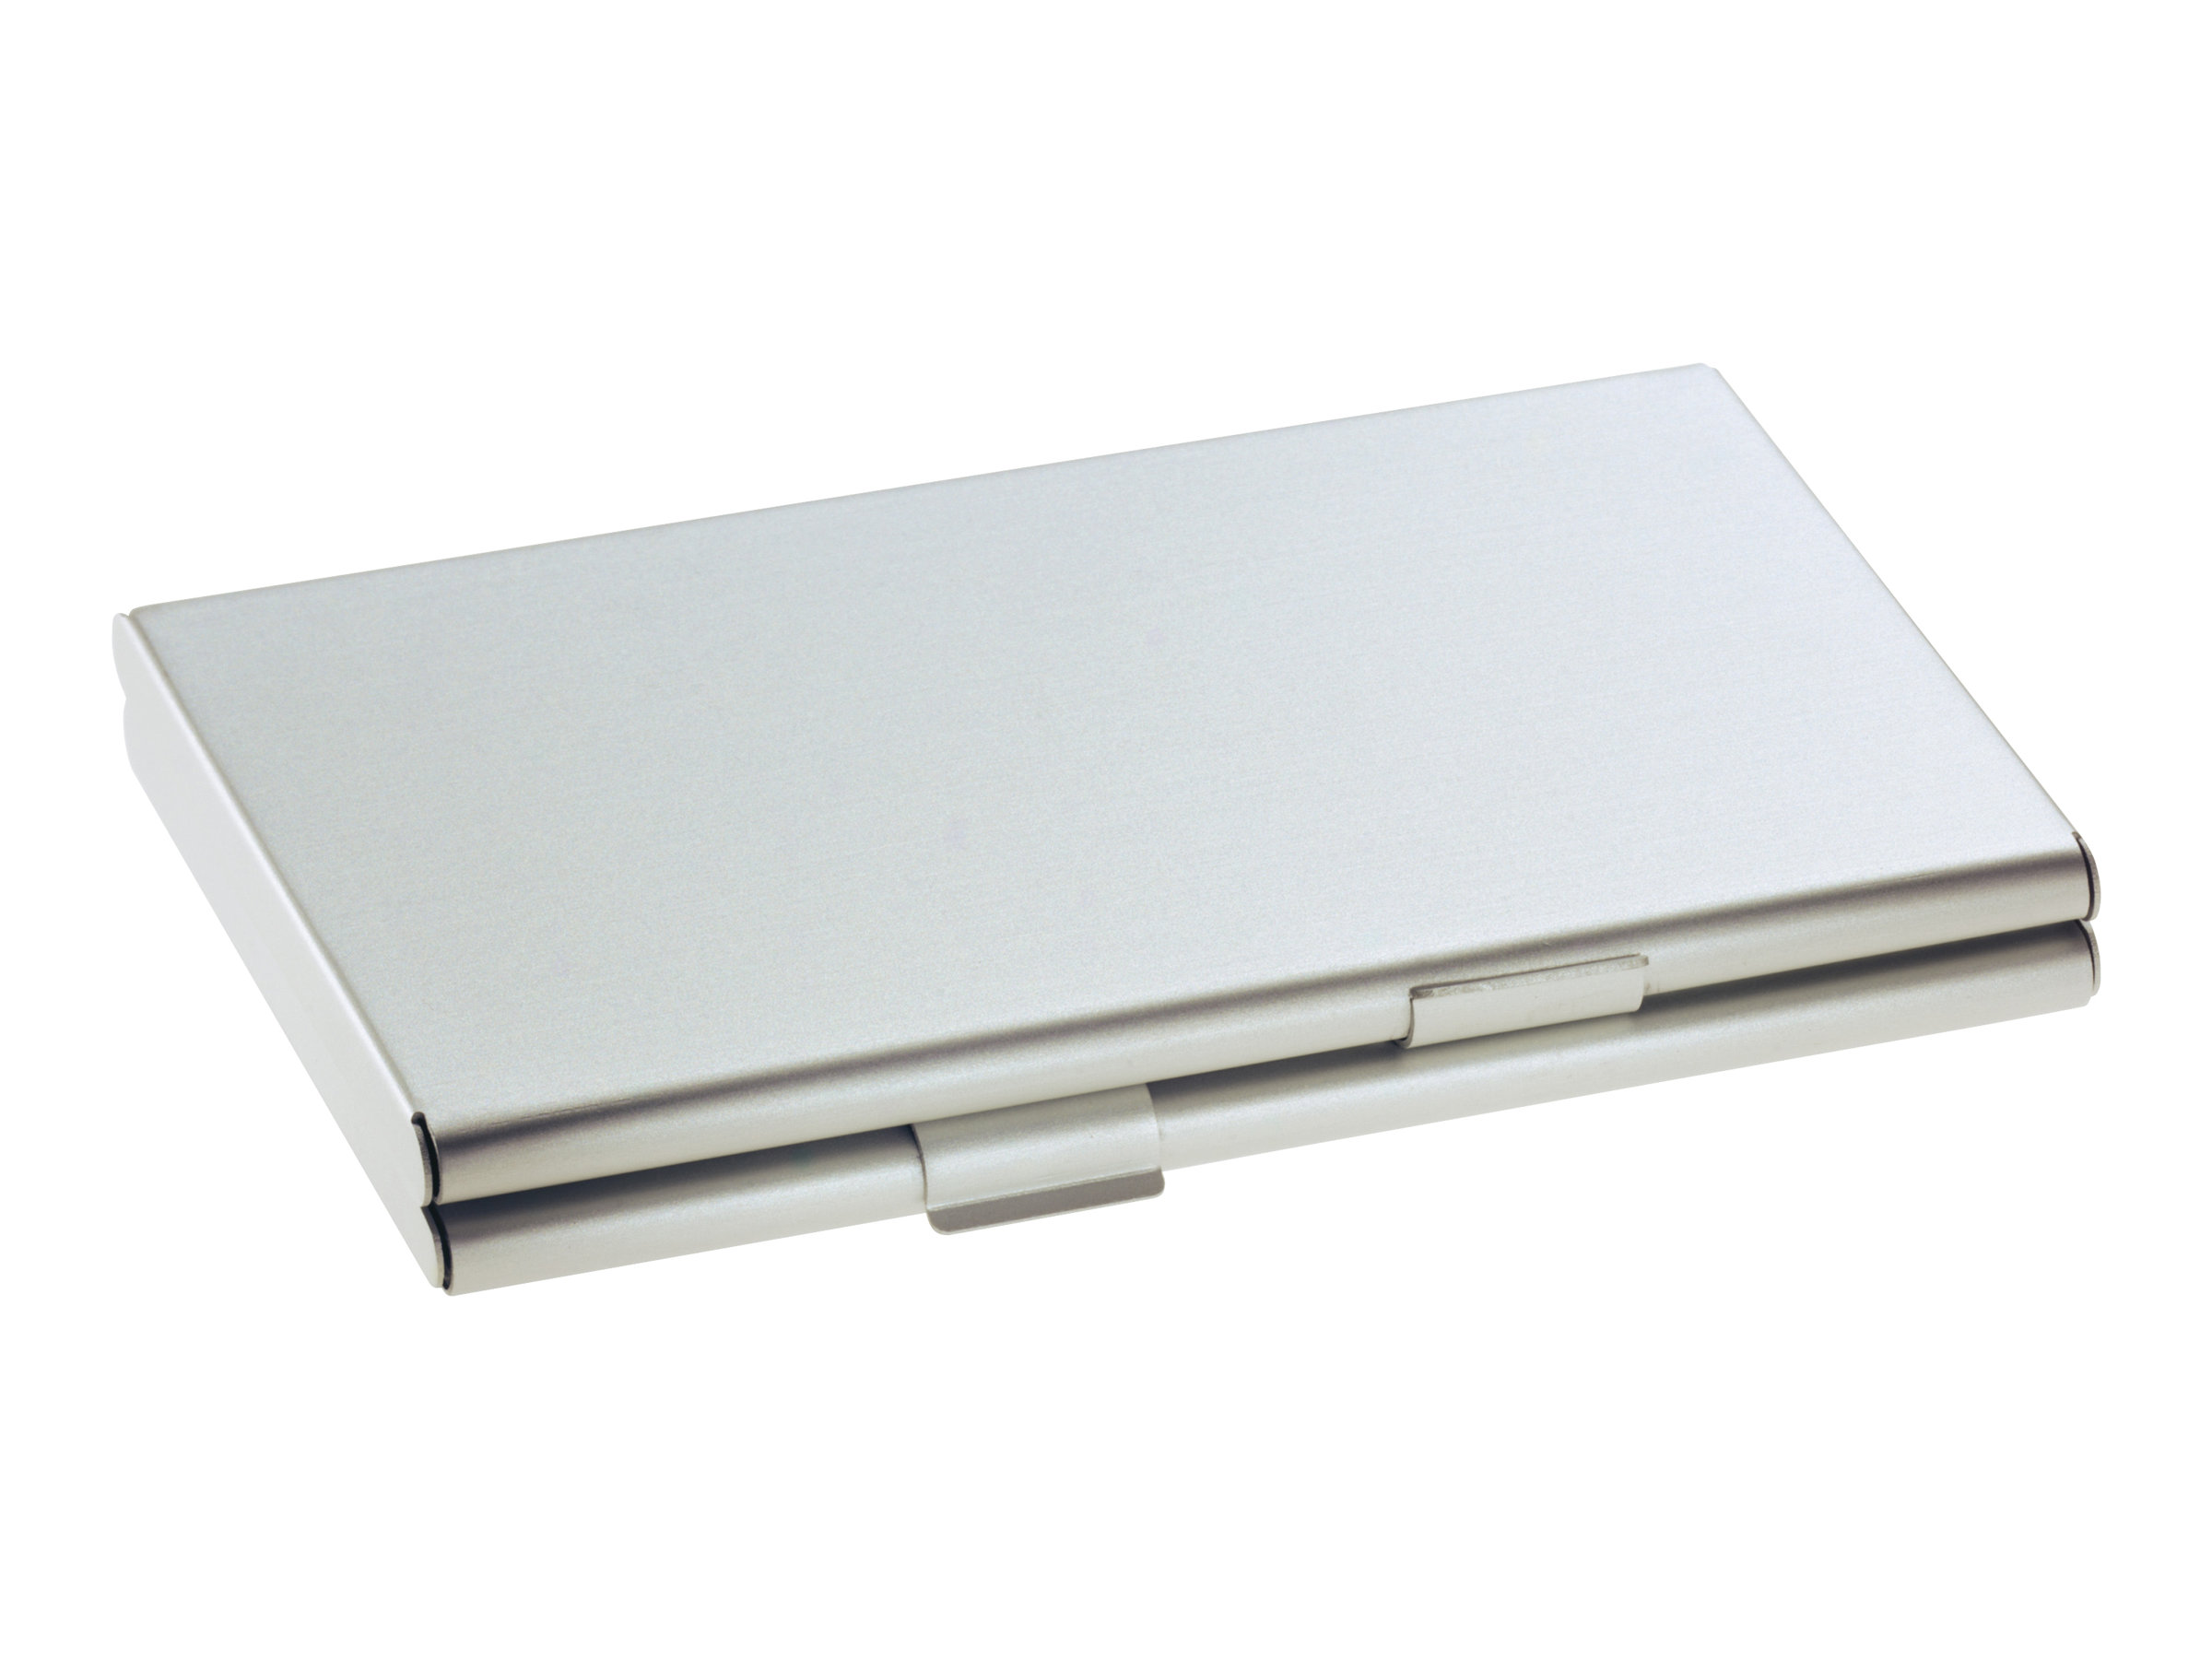 sigel porte cartes de visite aluminium argente mat zoom left angle